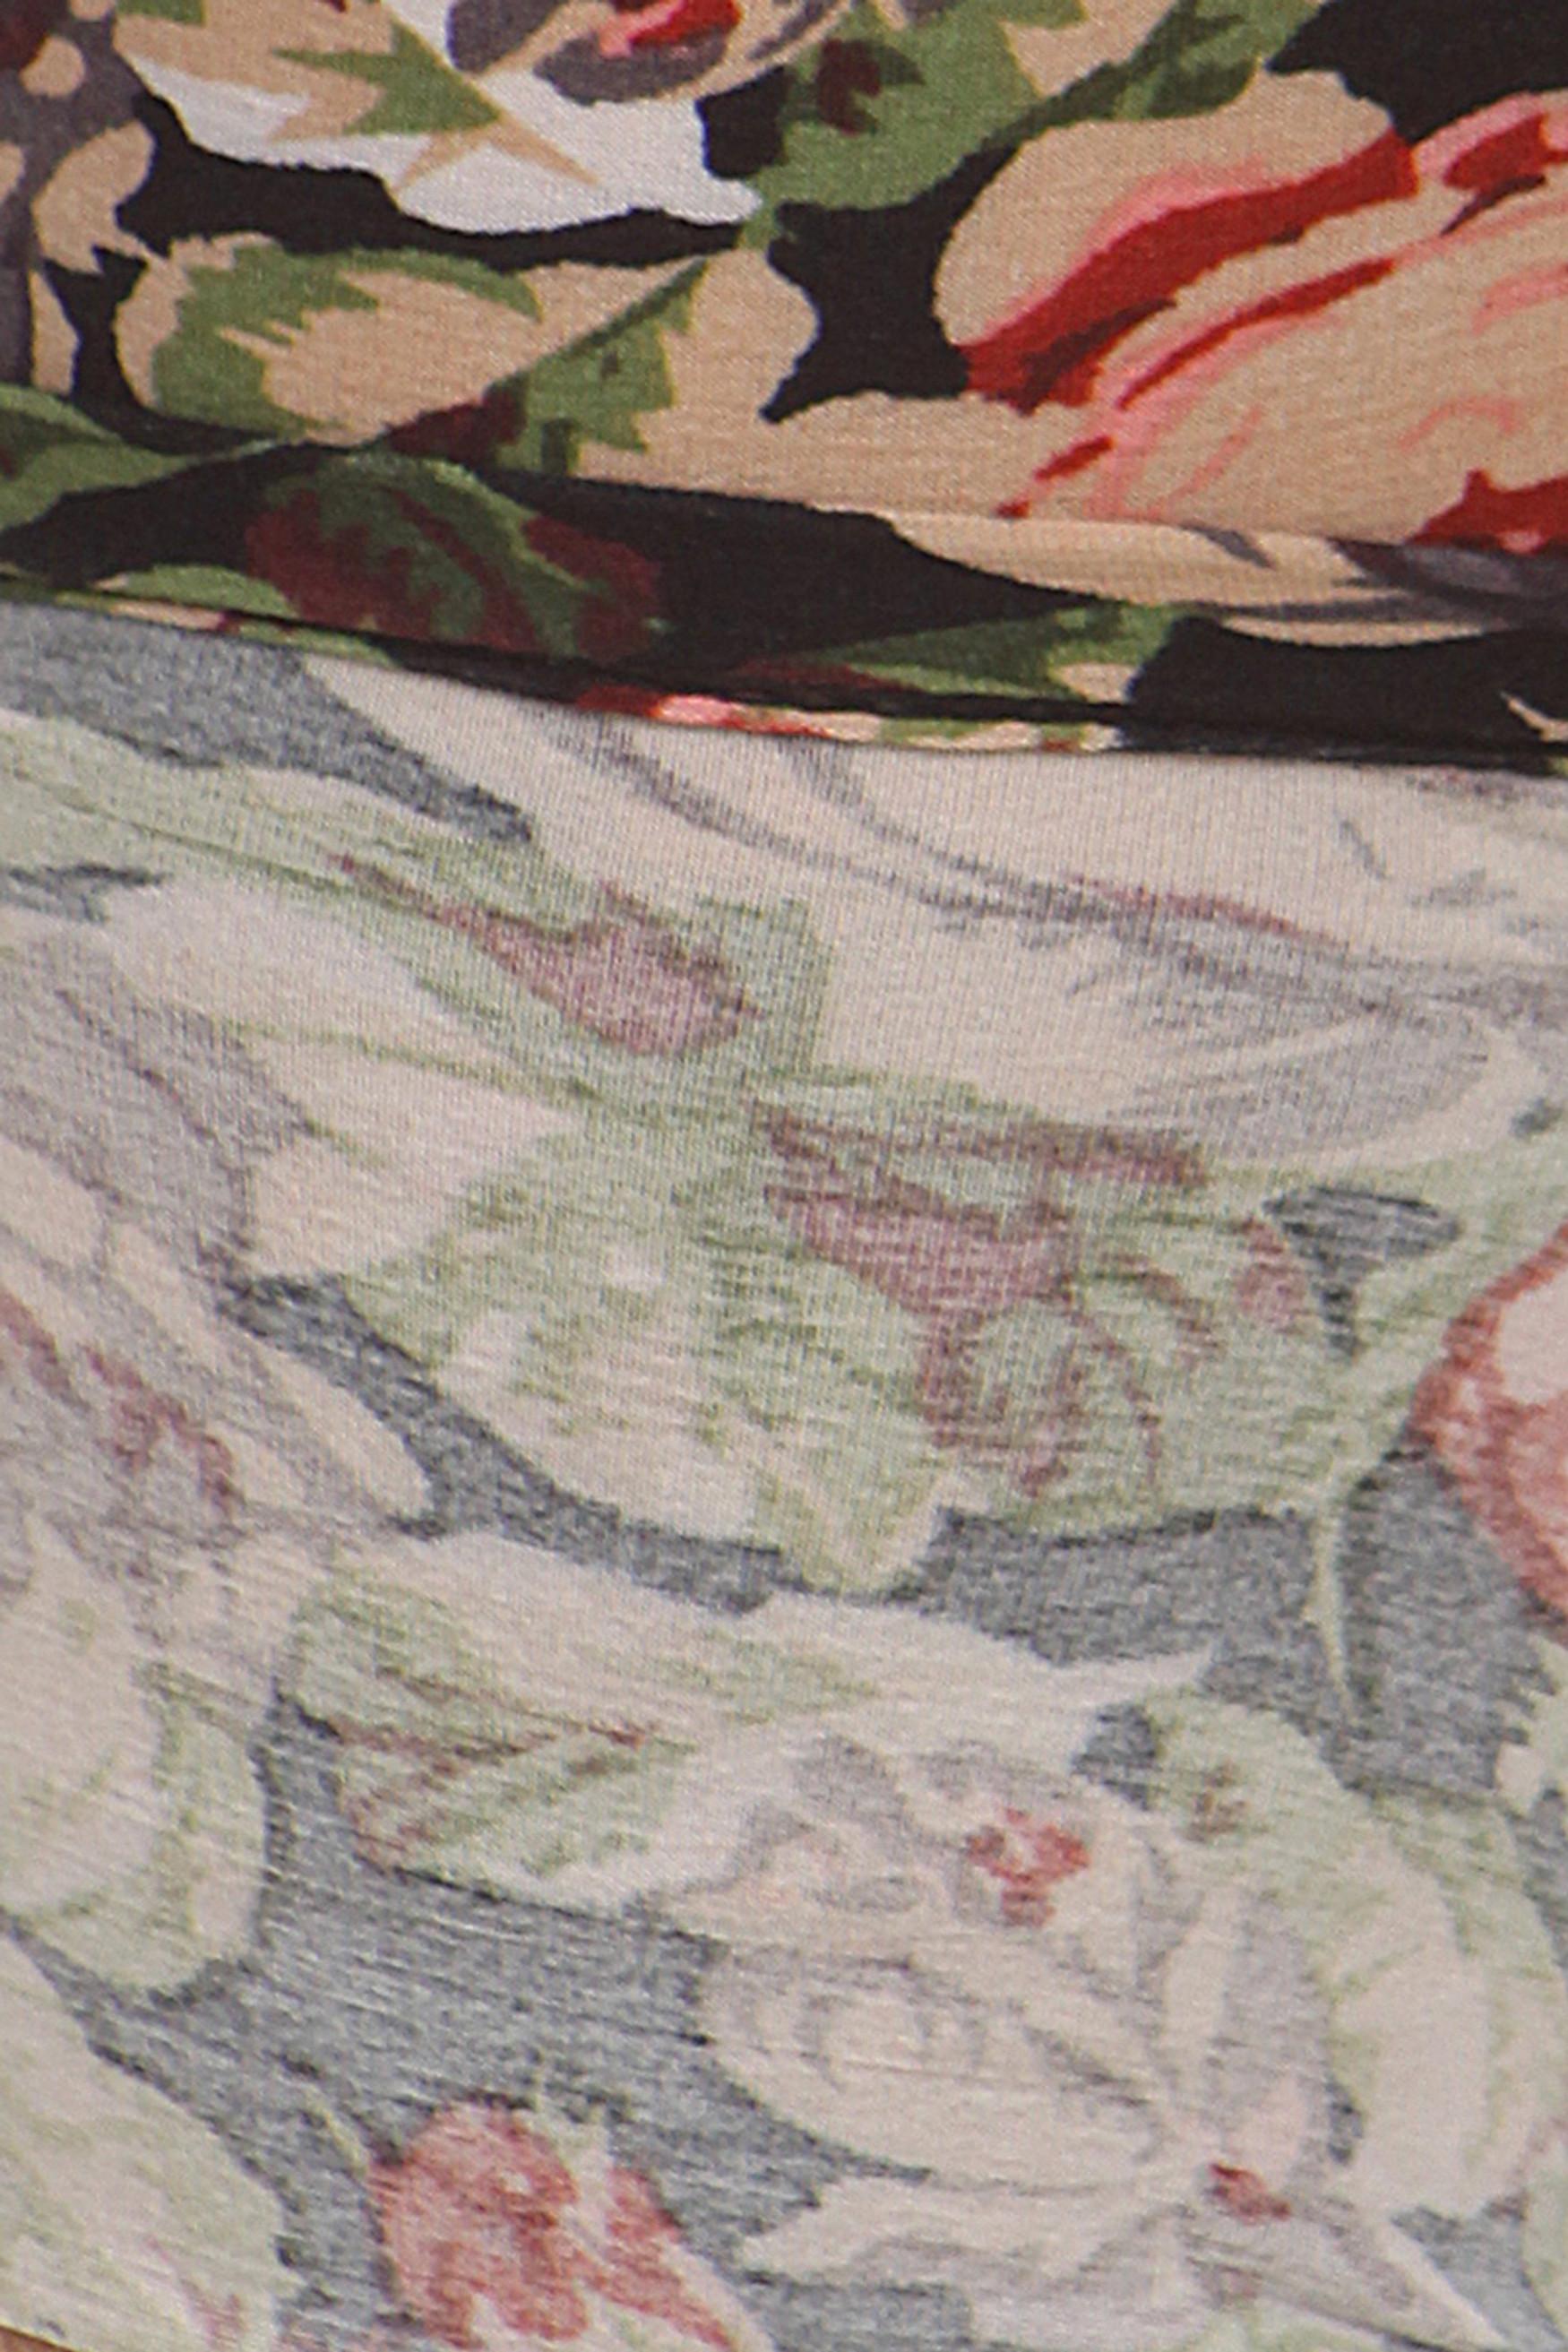 Close up fabric image of Brushed Plus Size Vintage Floral Leggings